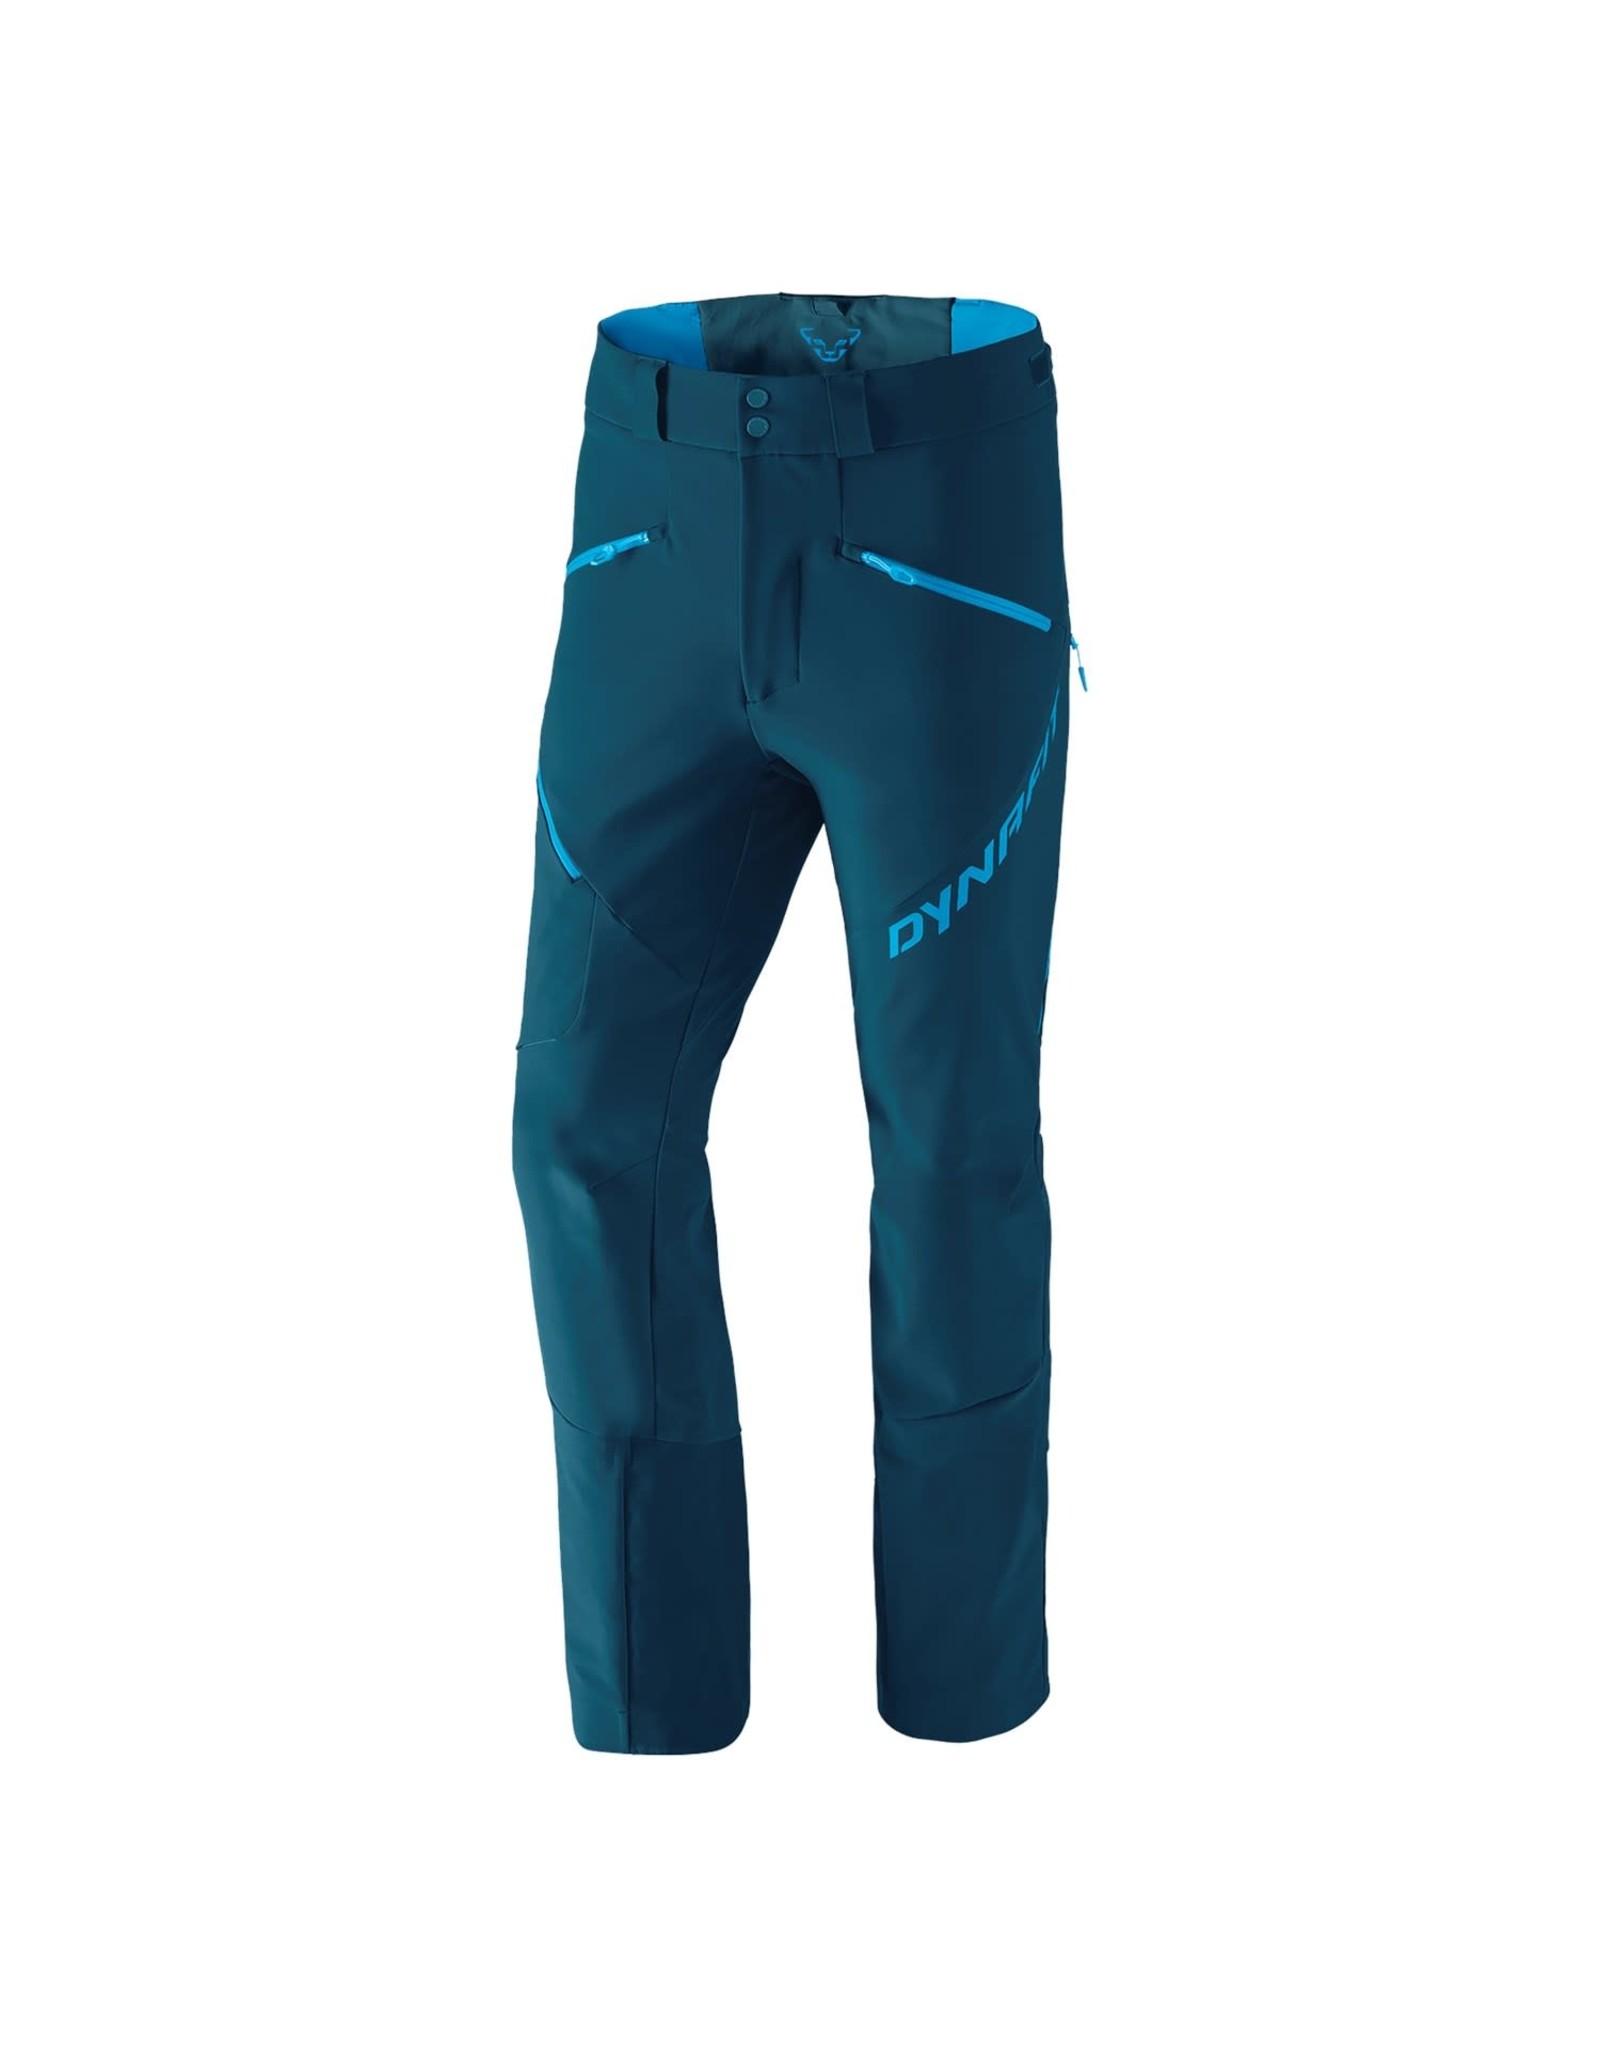 Dynafit Dynafit Mercury Pro Shoftshell Pants - Men